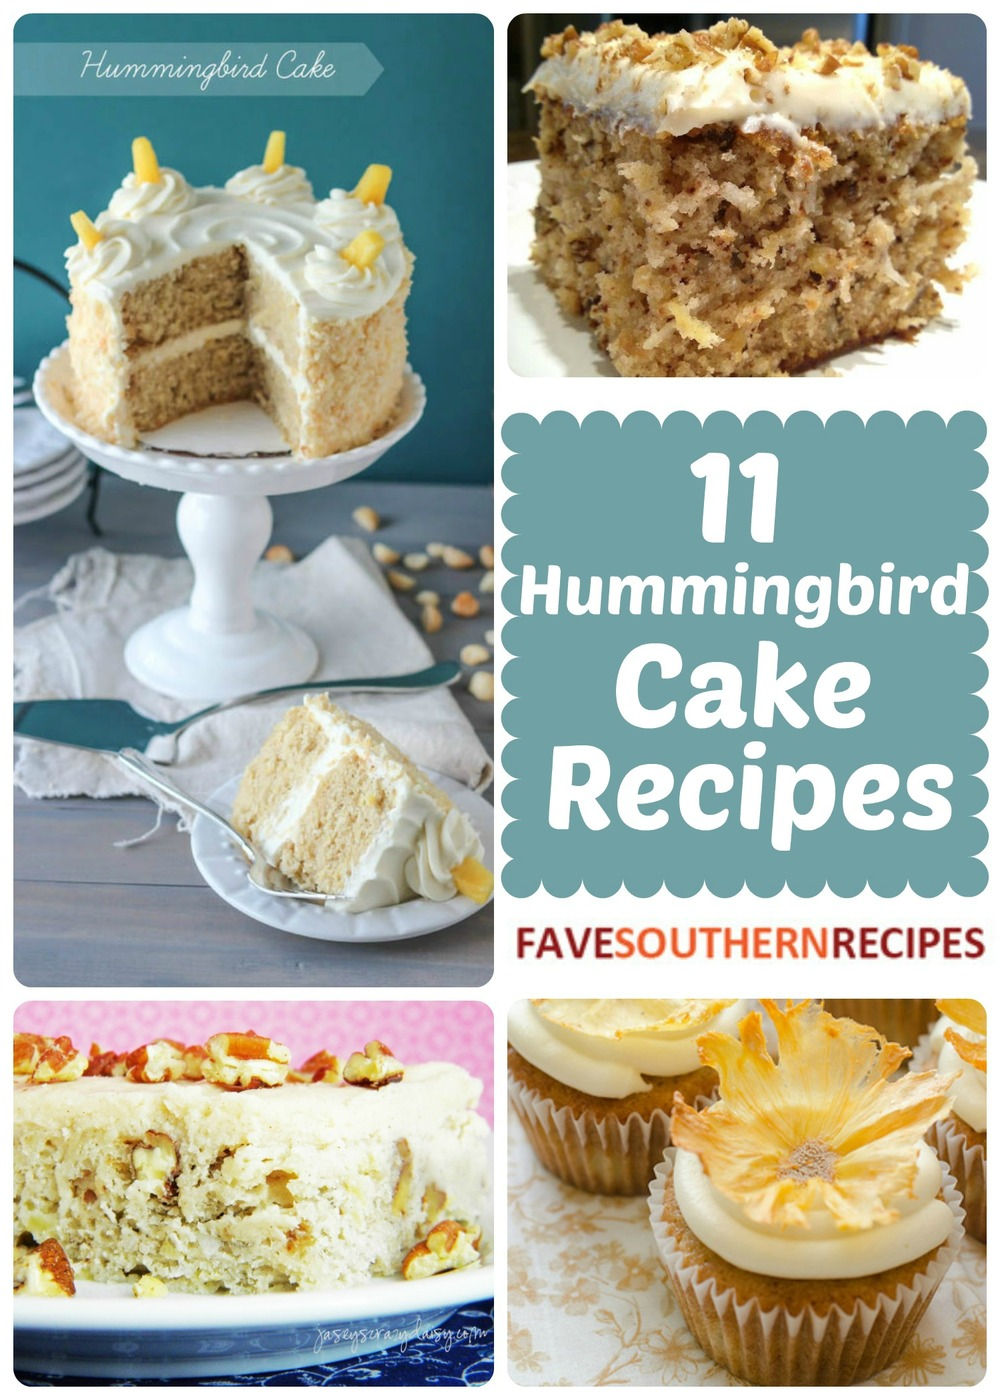 11 Hummingbird Cake Recipes The Best Southern Desserts